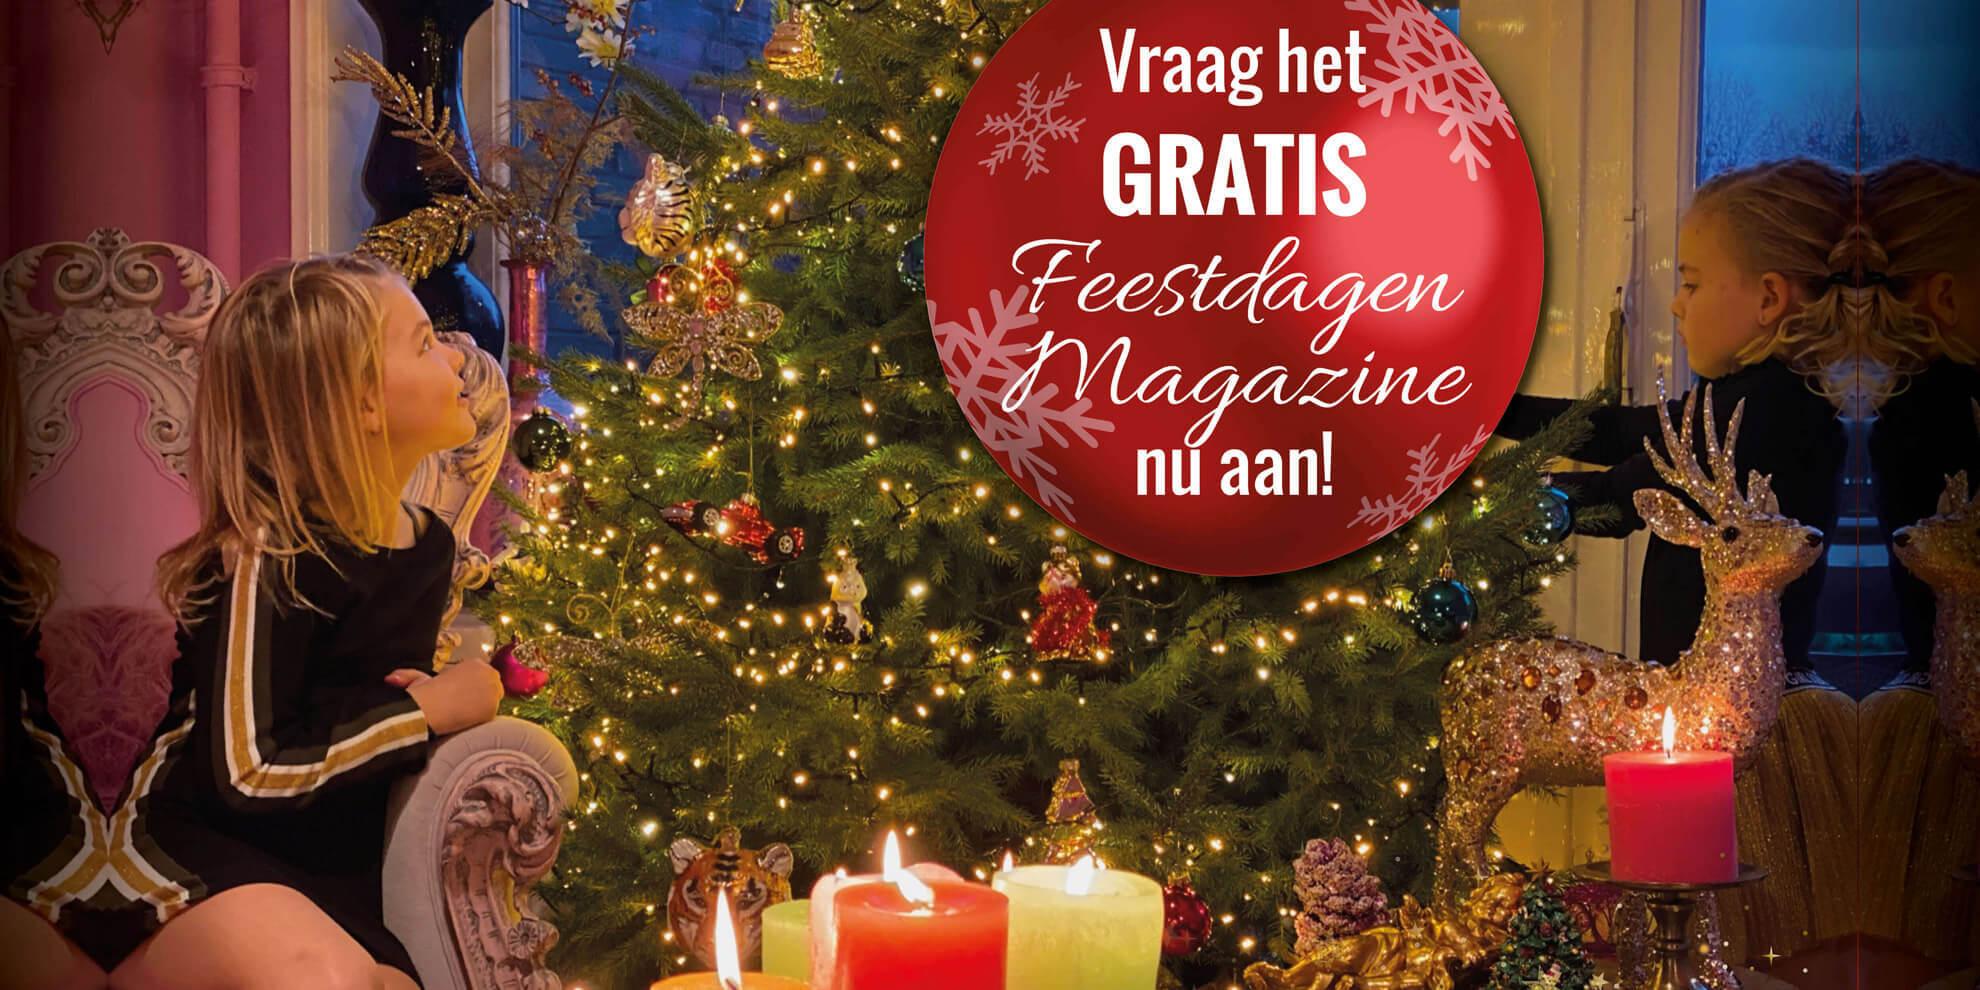 Gratis Aviko Feestdagen Magazine